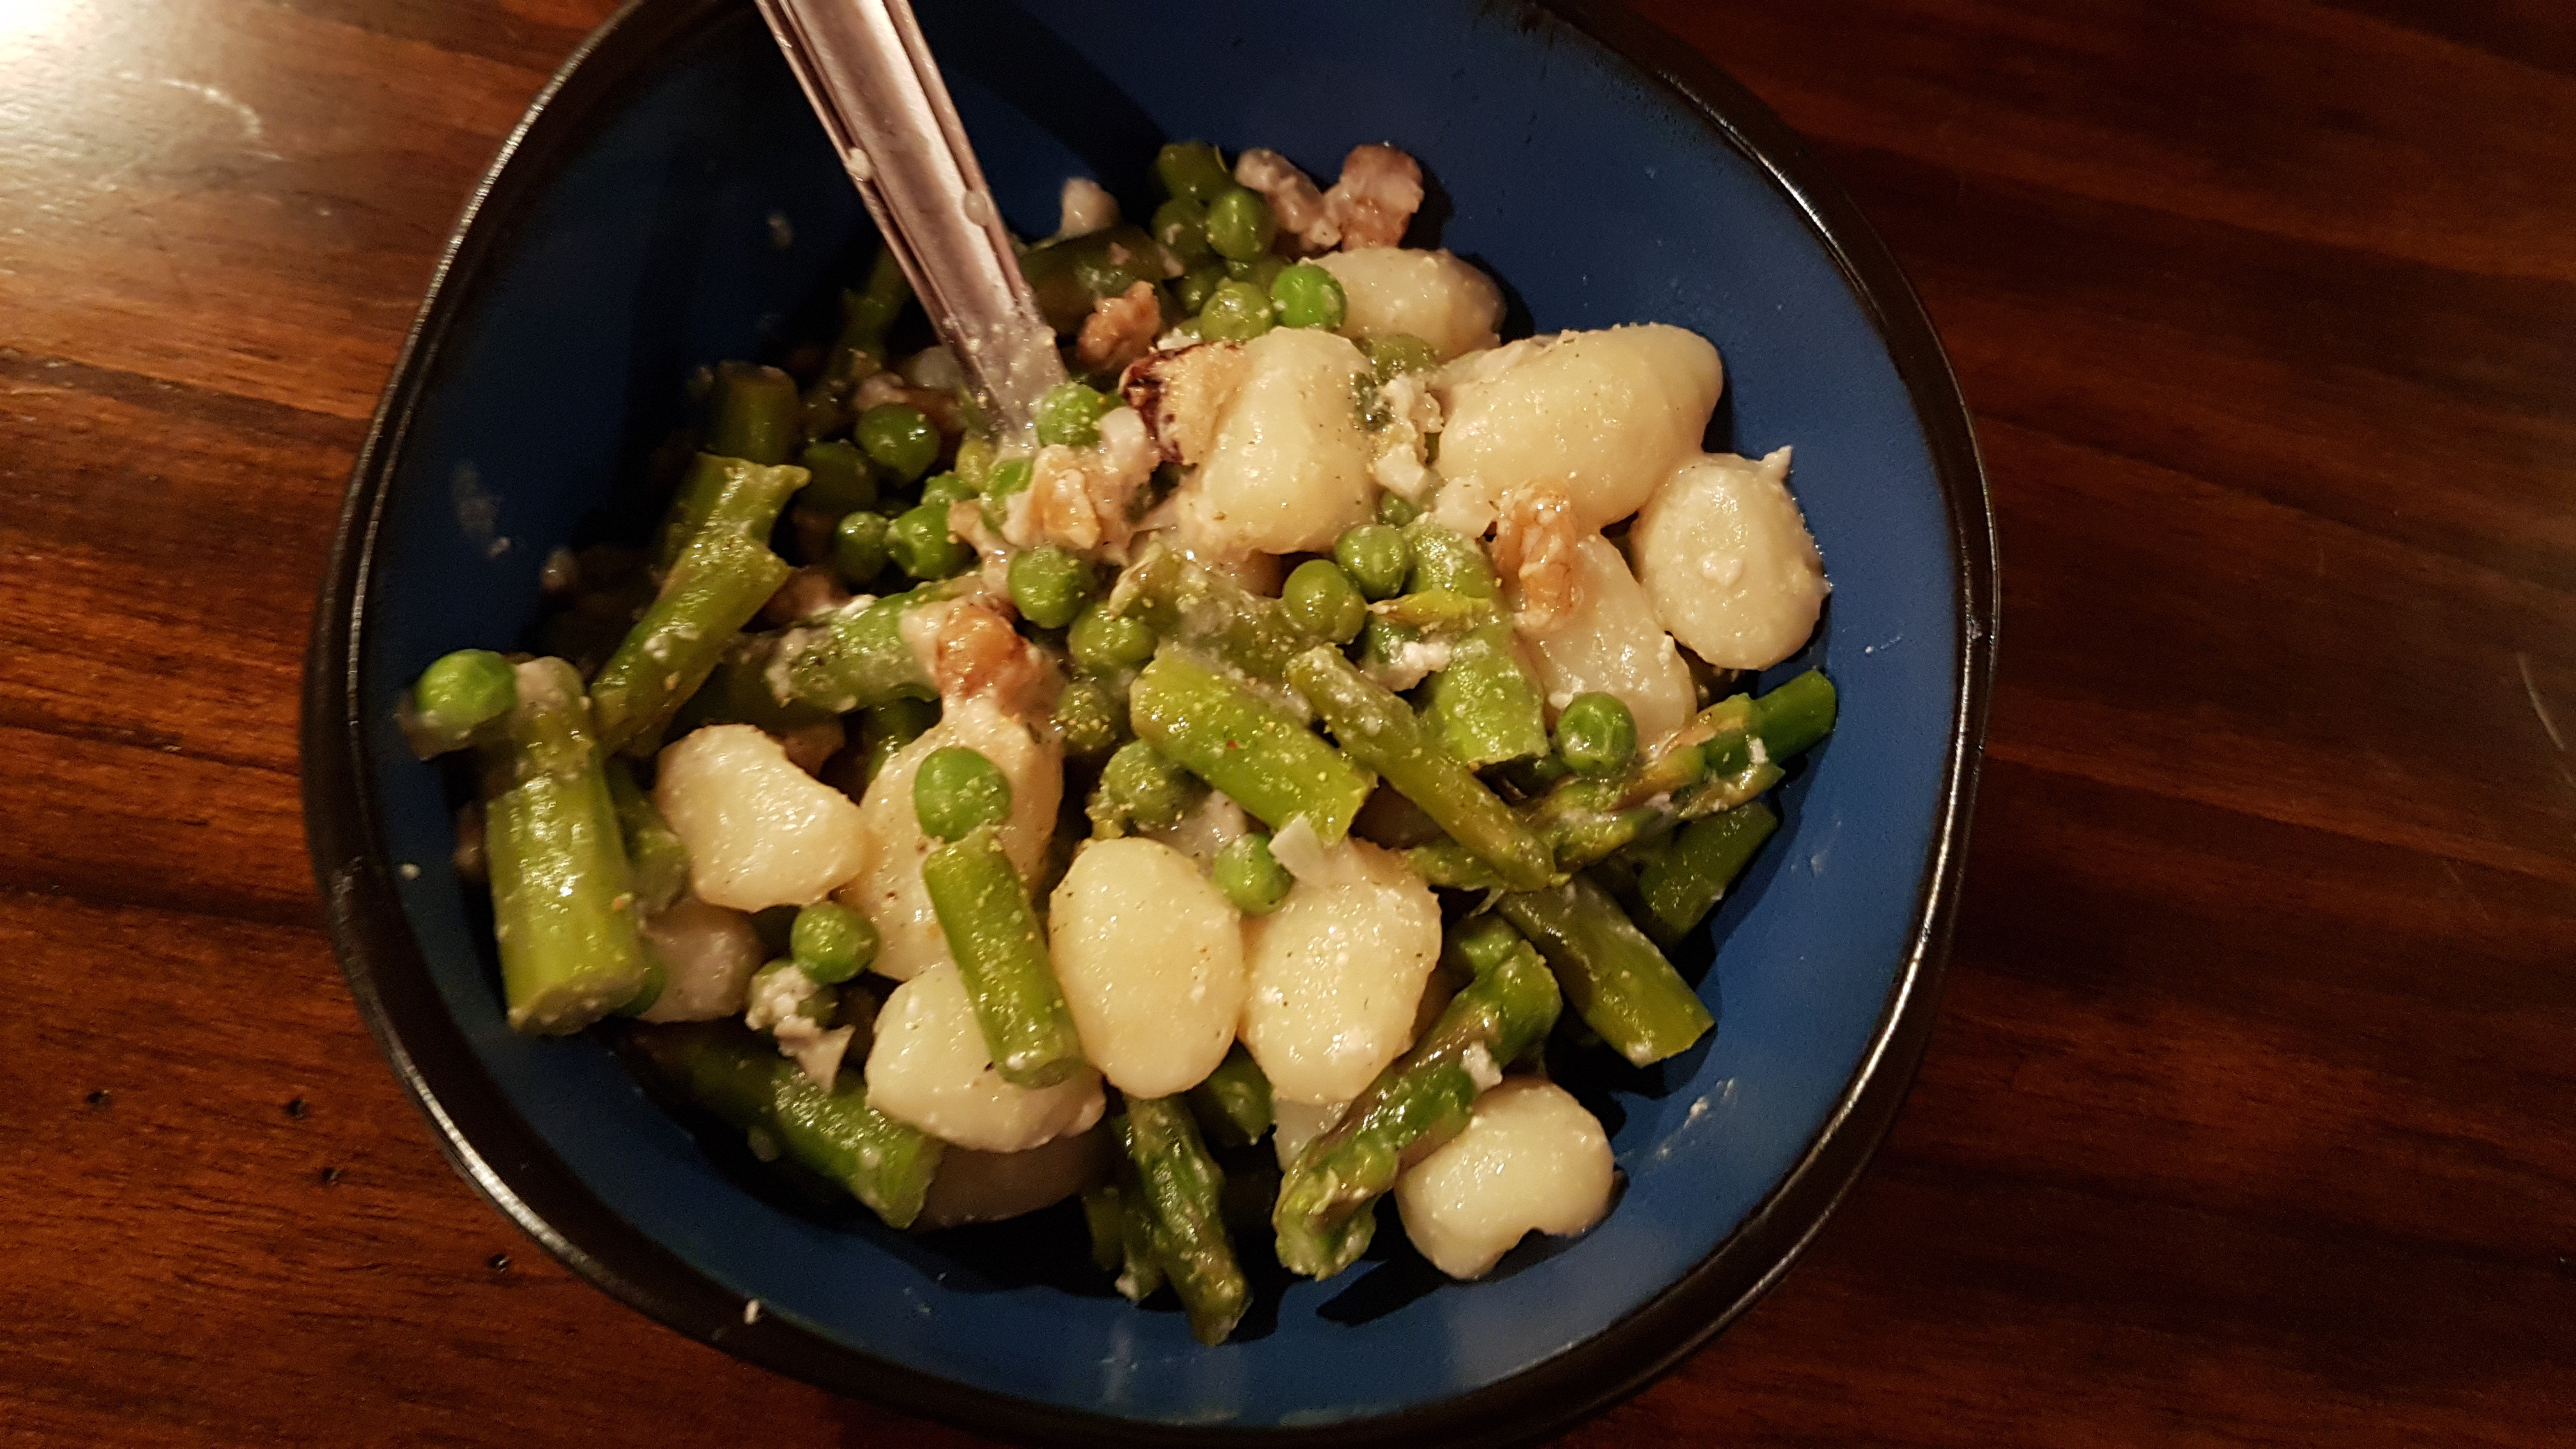 Spring Green Creamy Asparagus & Peas Gnocchi